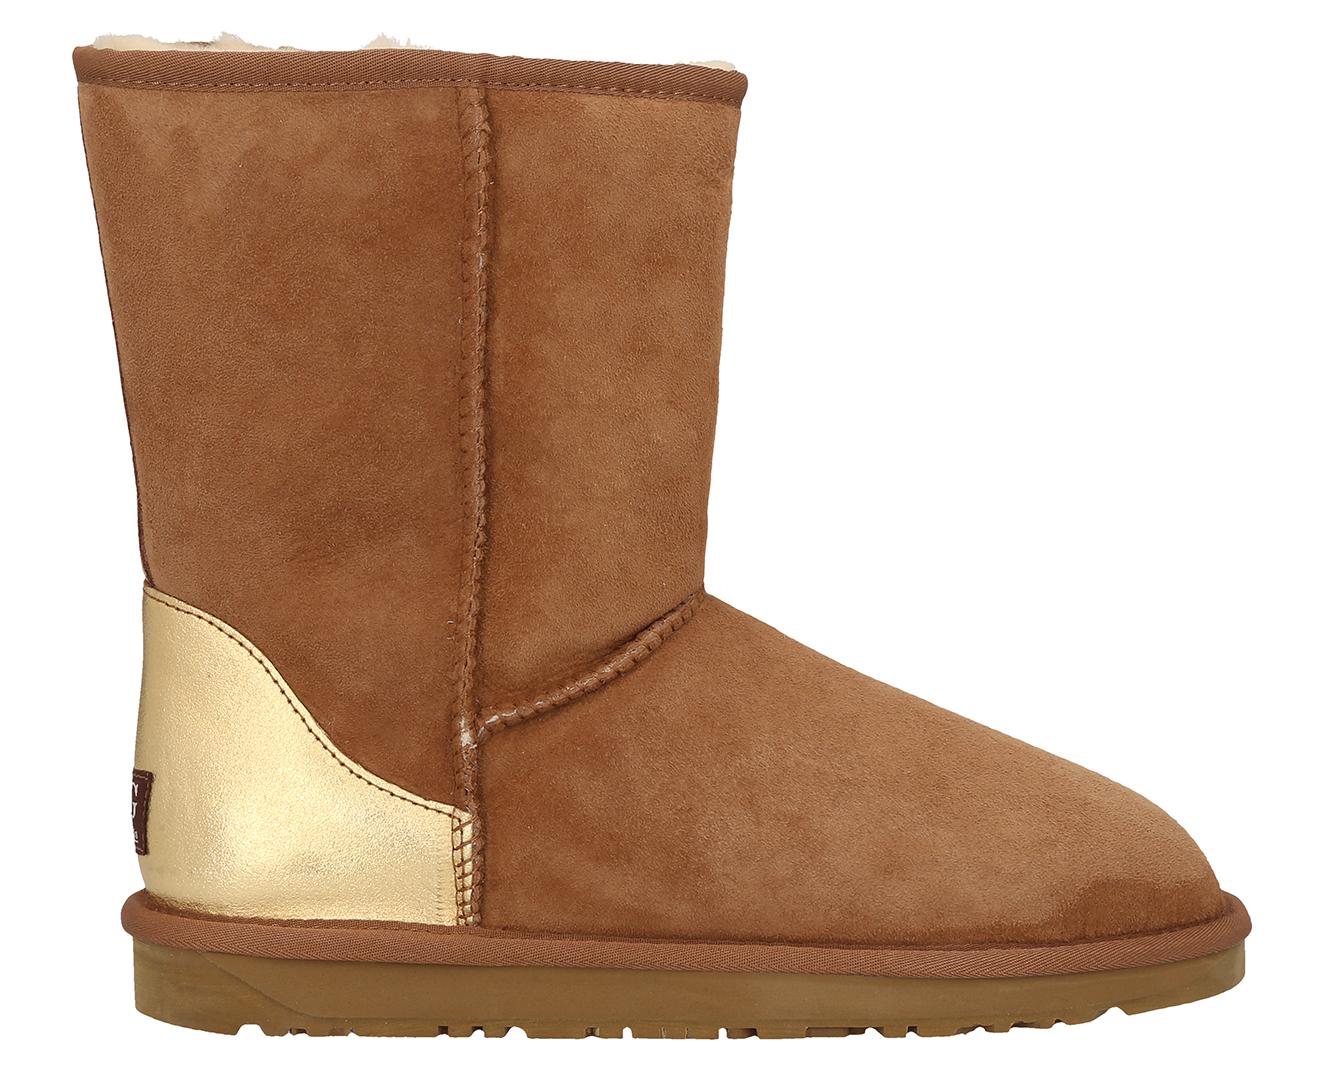 fff5dea9354 Bluestar Premium Australian Sheepskin 3/4 Ugg Boot - Chestnut/Gold